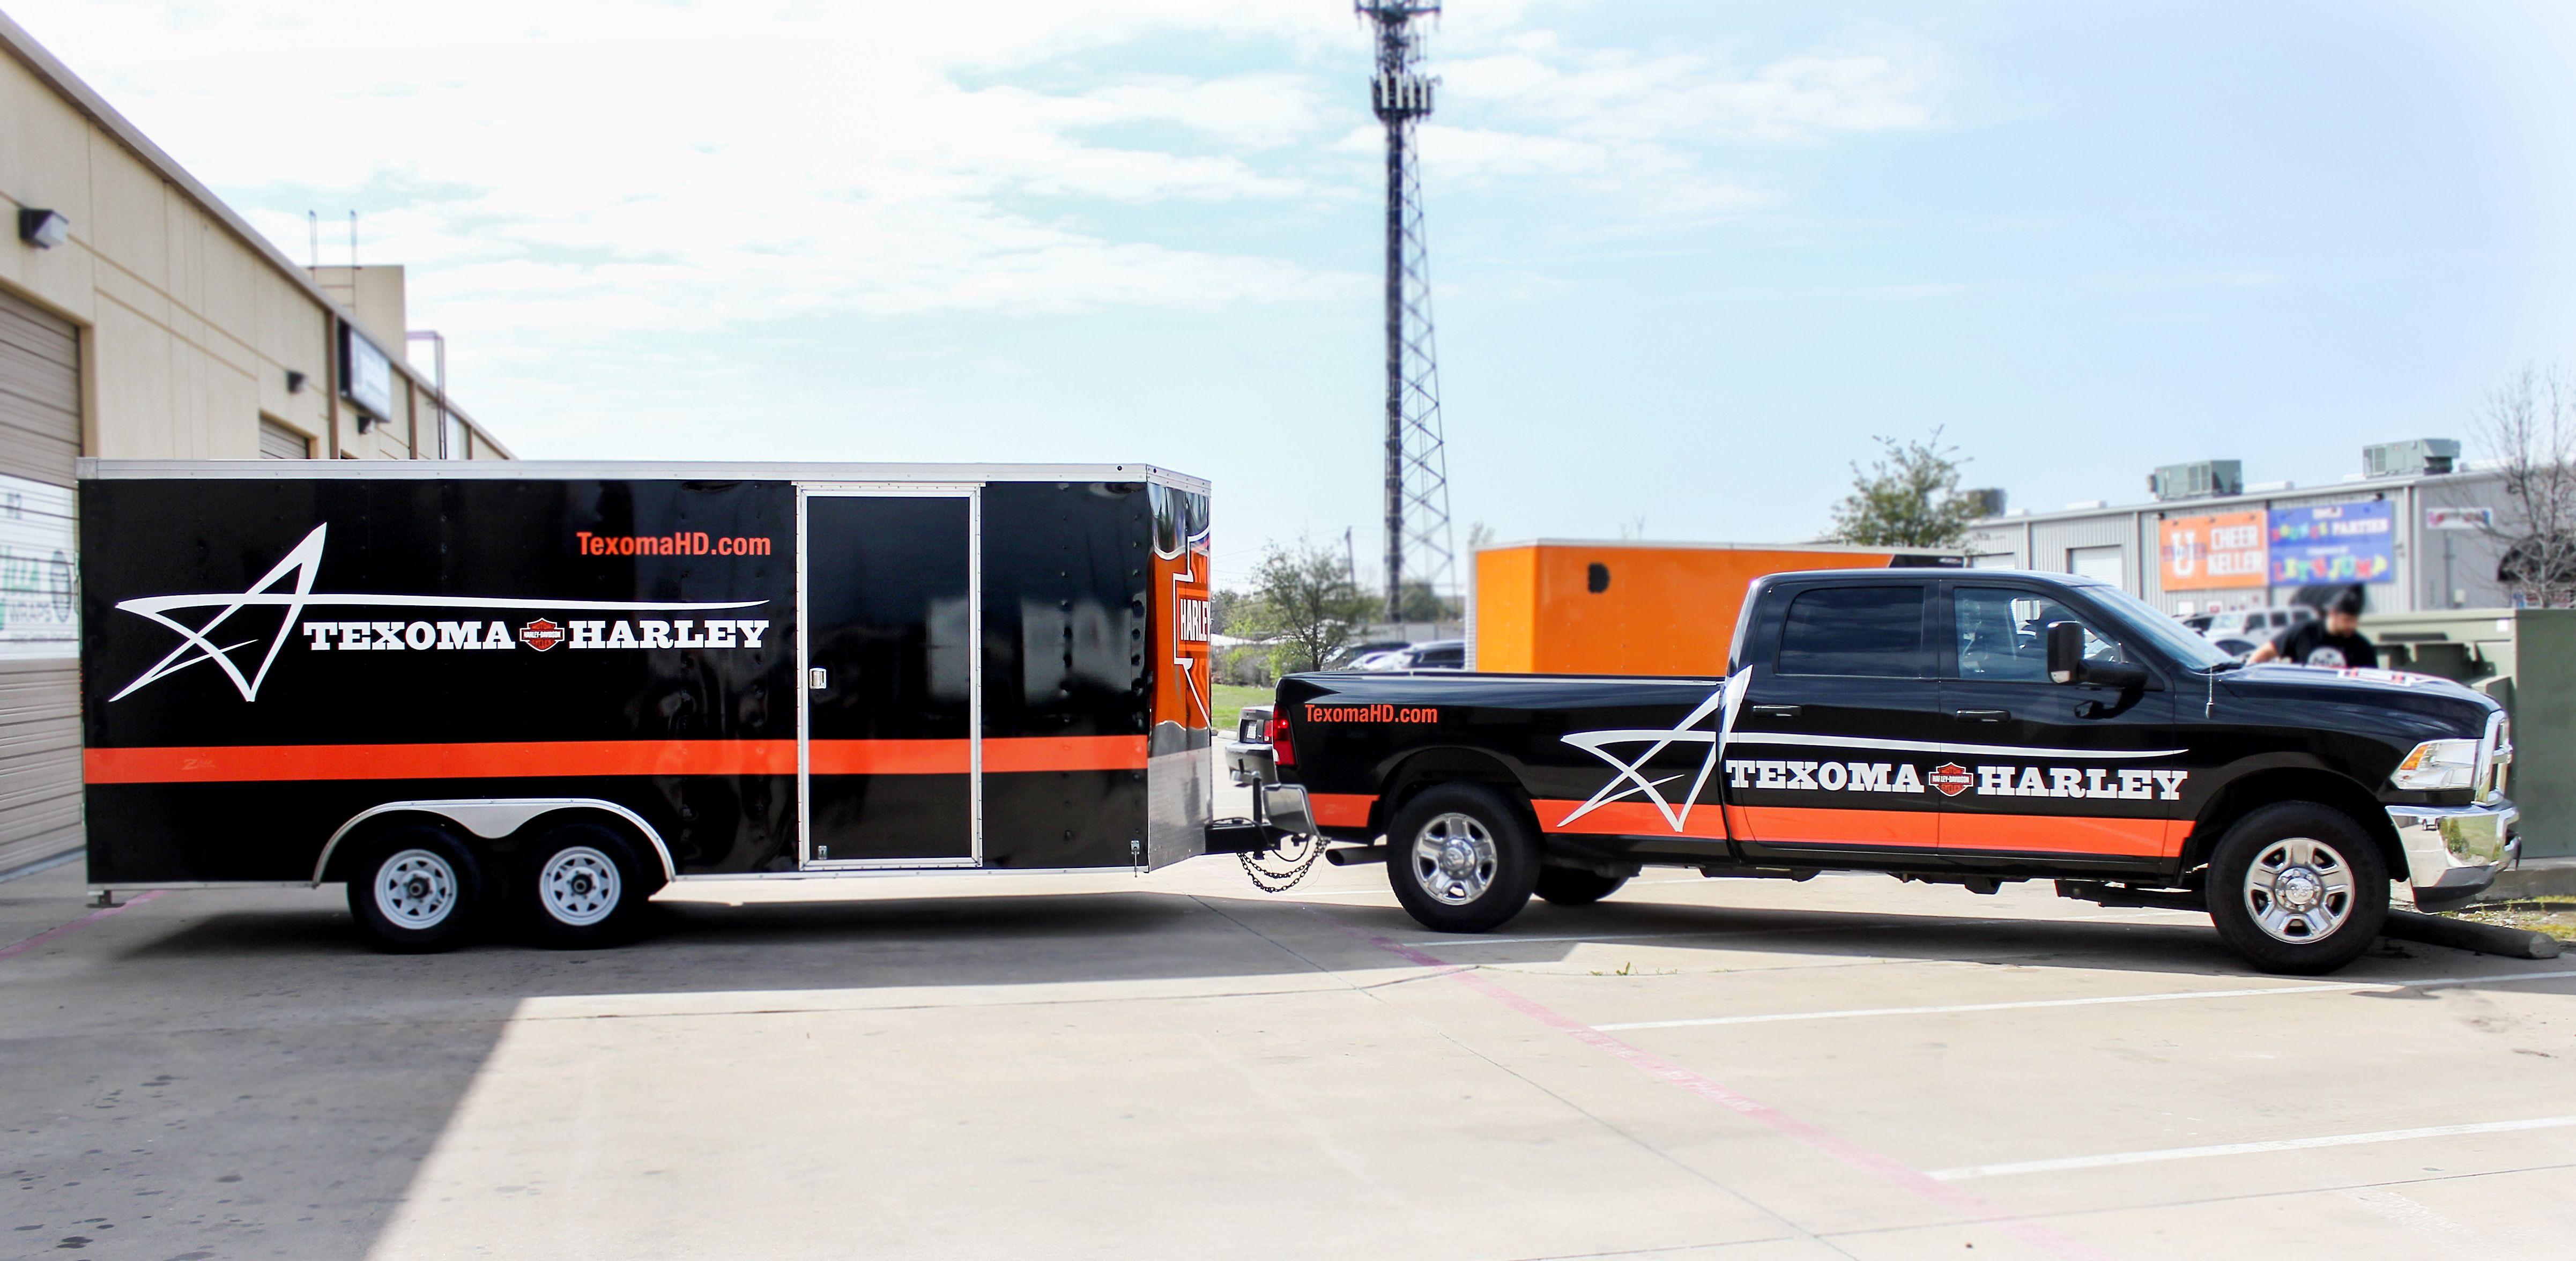 Texas harley davidson truck